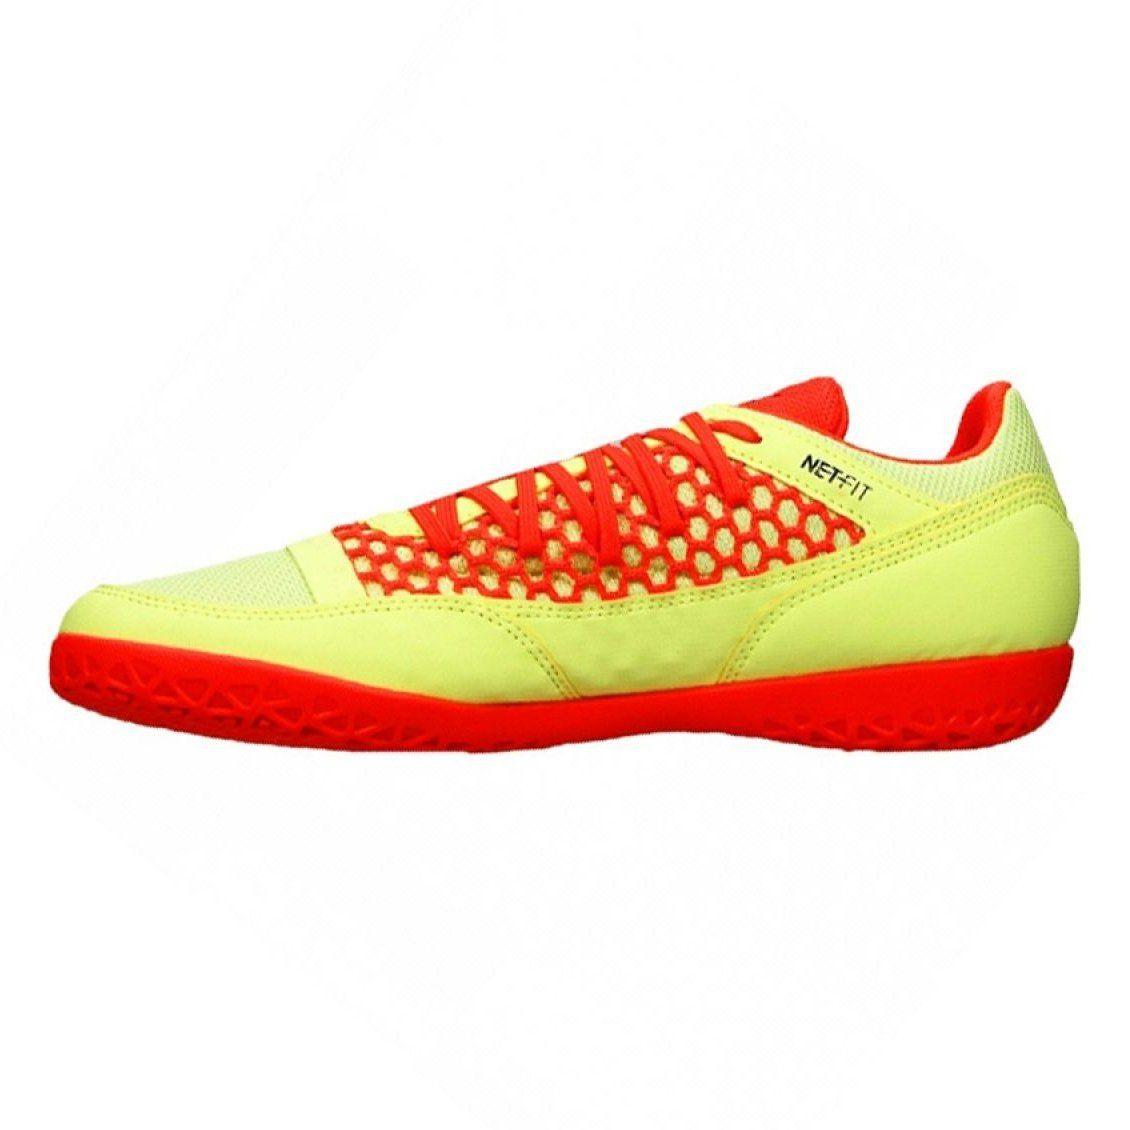 Sportowe Meskie Puma Zolte Buty Sportowe Puma 365 Nf Ct M 104875 01 Shoes Sneakers Fashion